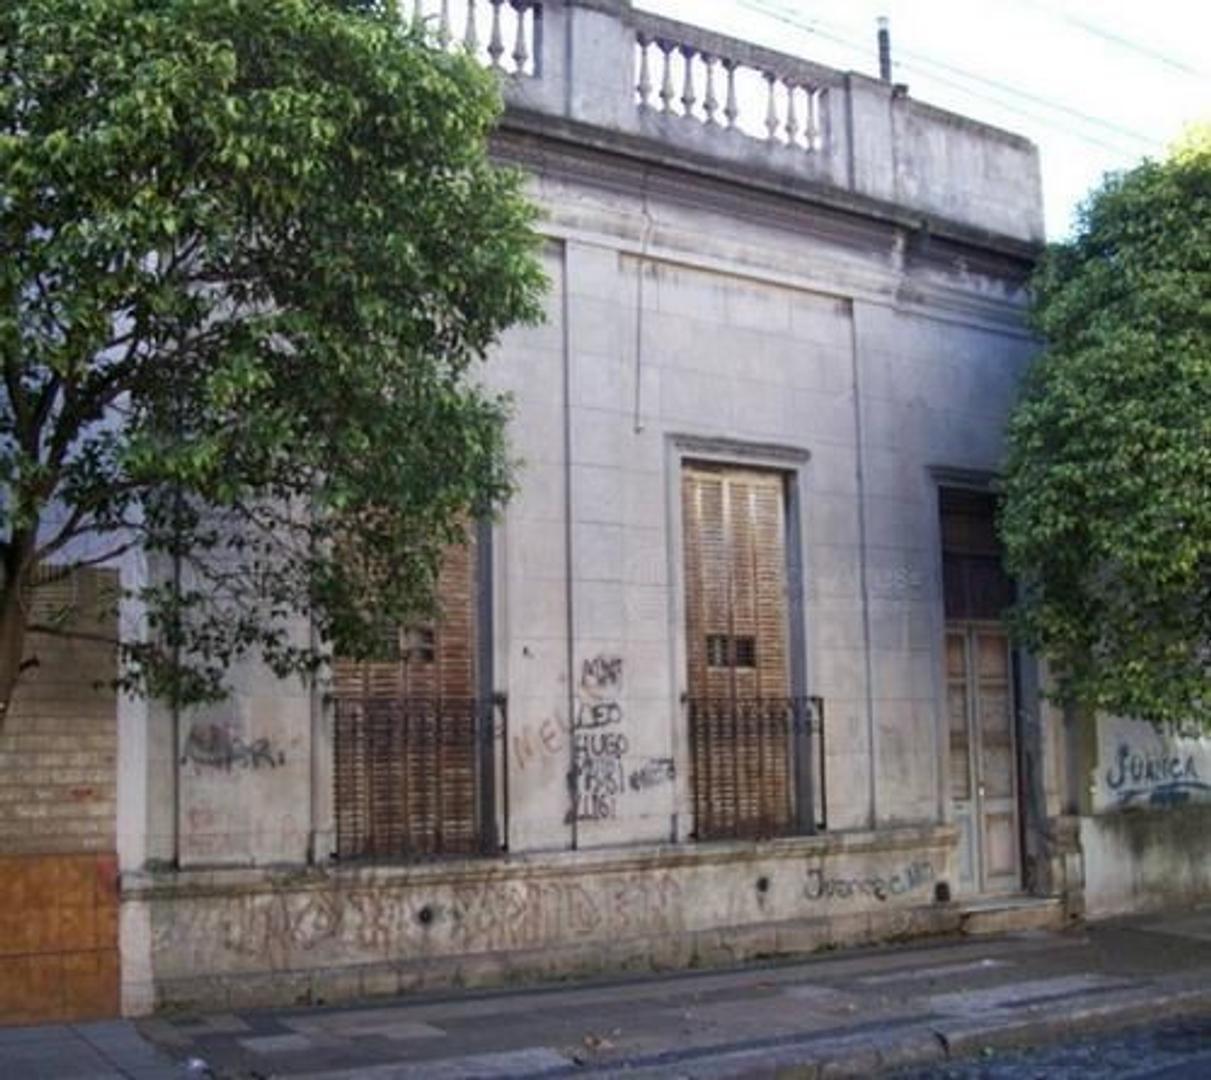 Zelaya 3100, lote de Frente (m): 8.66 Fondo (m):21.71.- Código de Planeamiento Urbano:R2b I